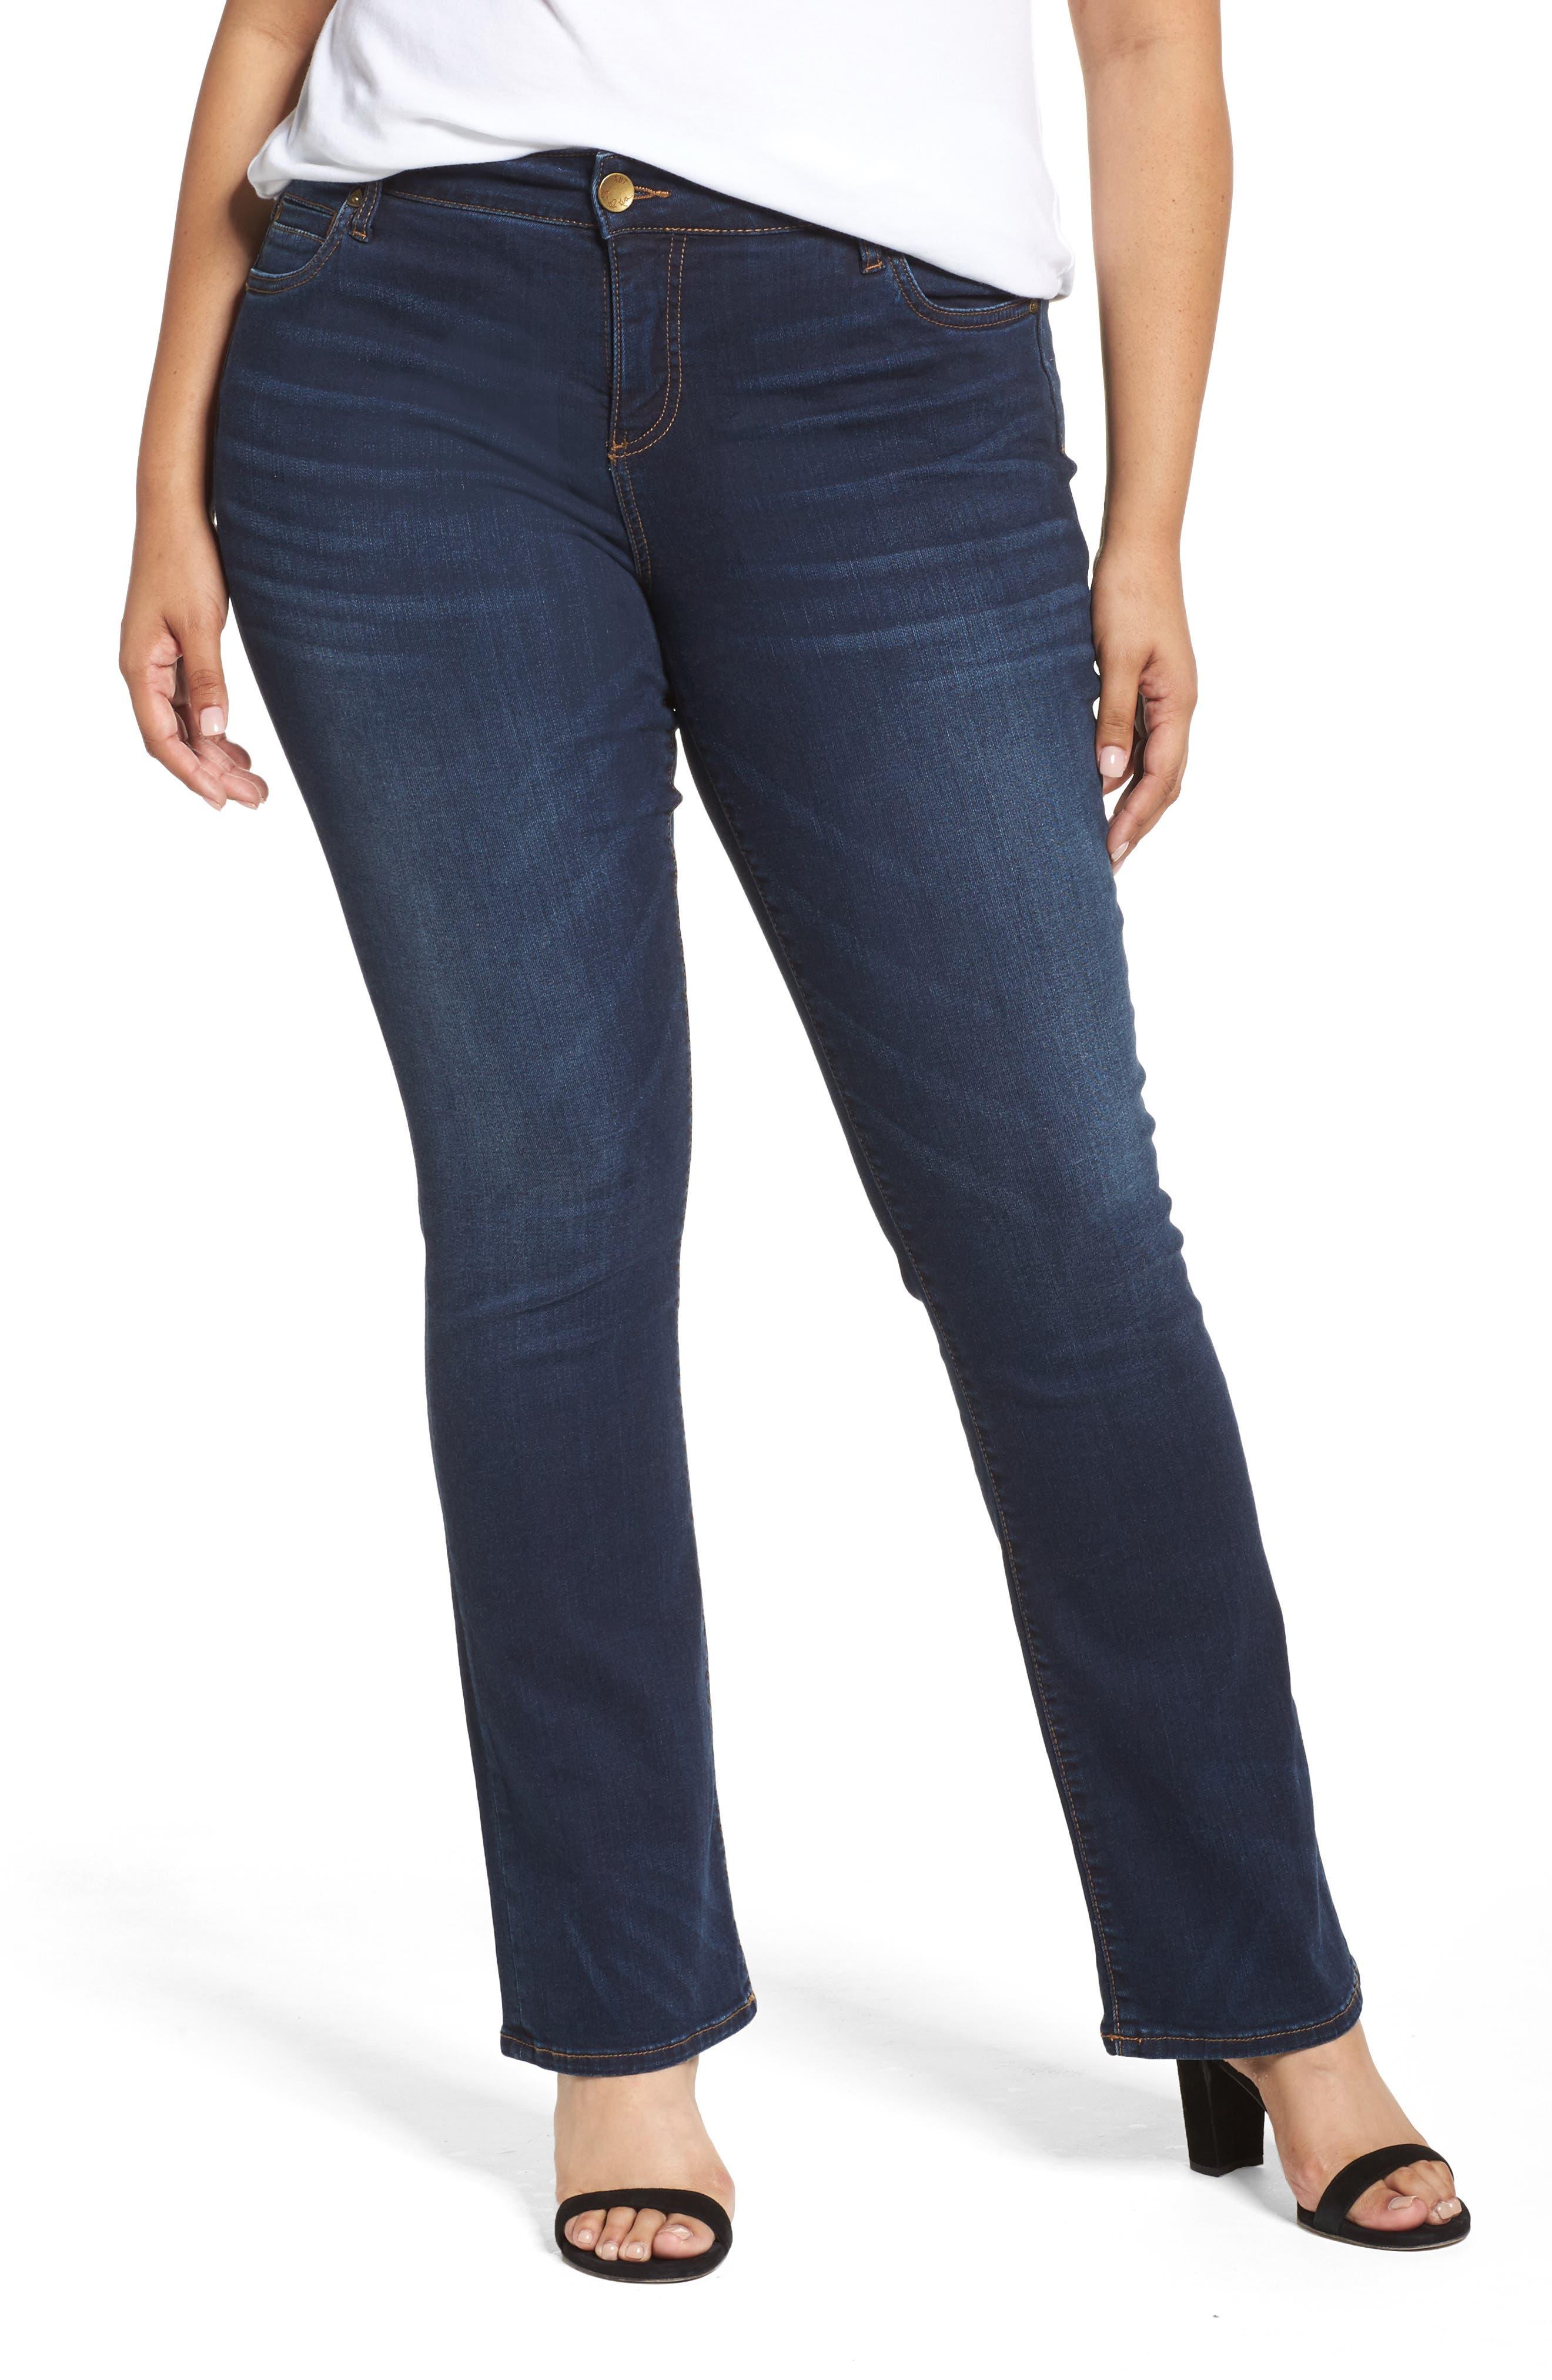 KUT FROM THE KLOTH, Natalie High Waist Bootcut Jeans, Main thumbnail 1, color, CLOSENESS W/ EURO BASE WASH